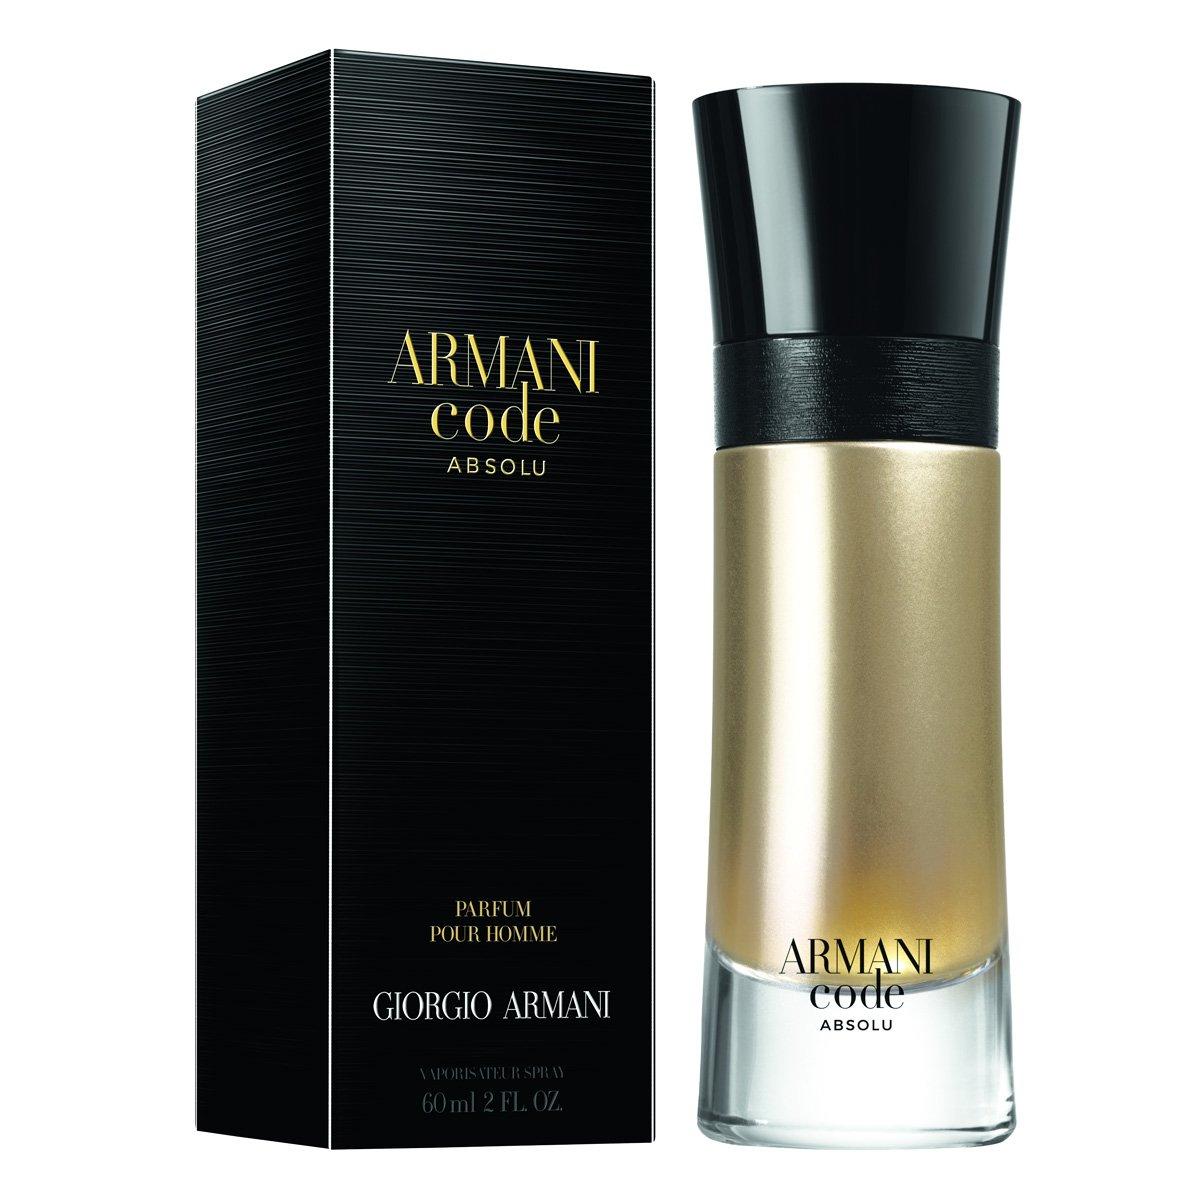 bc0c30bb785a Giorgio Armani Armani Code Absolu